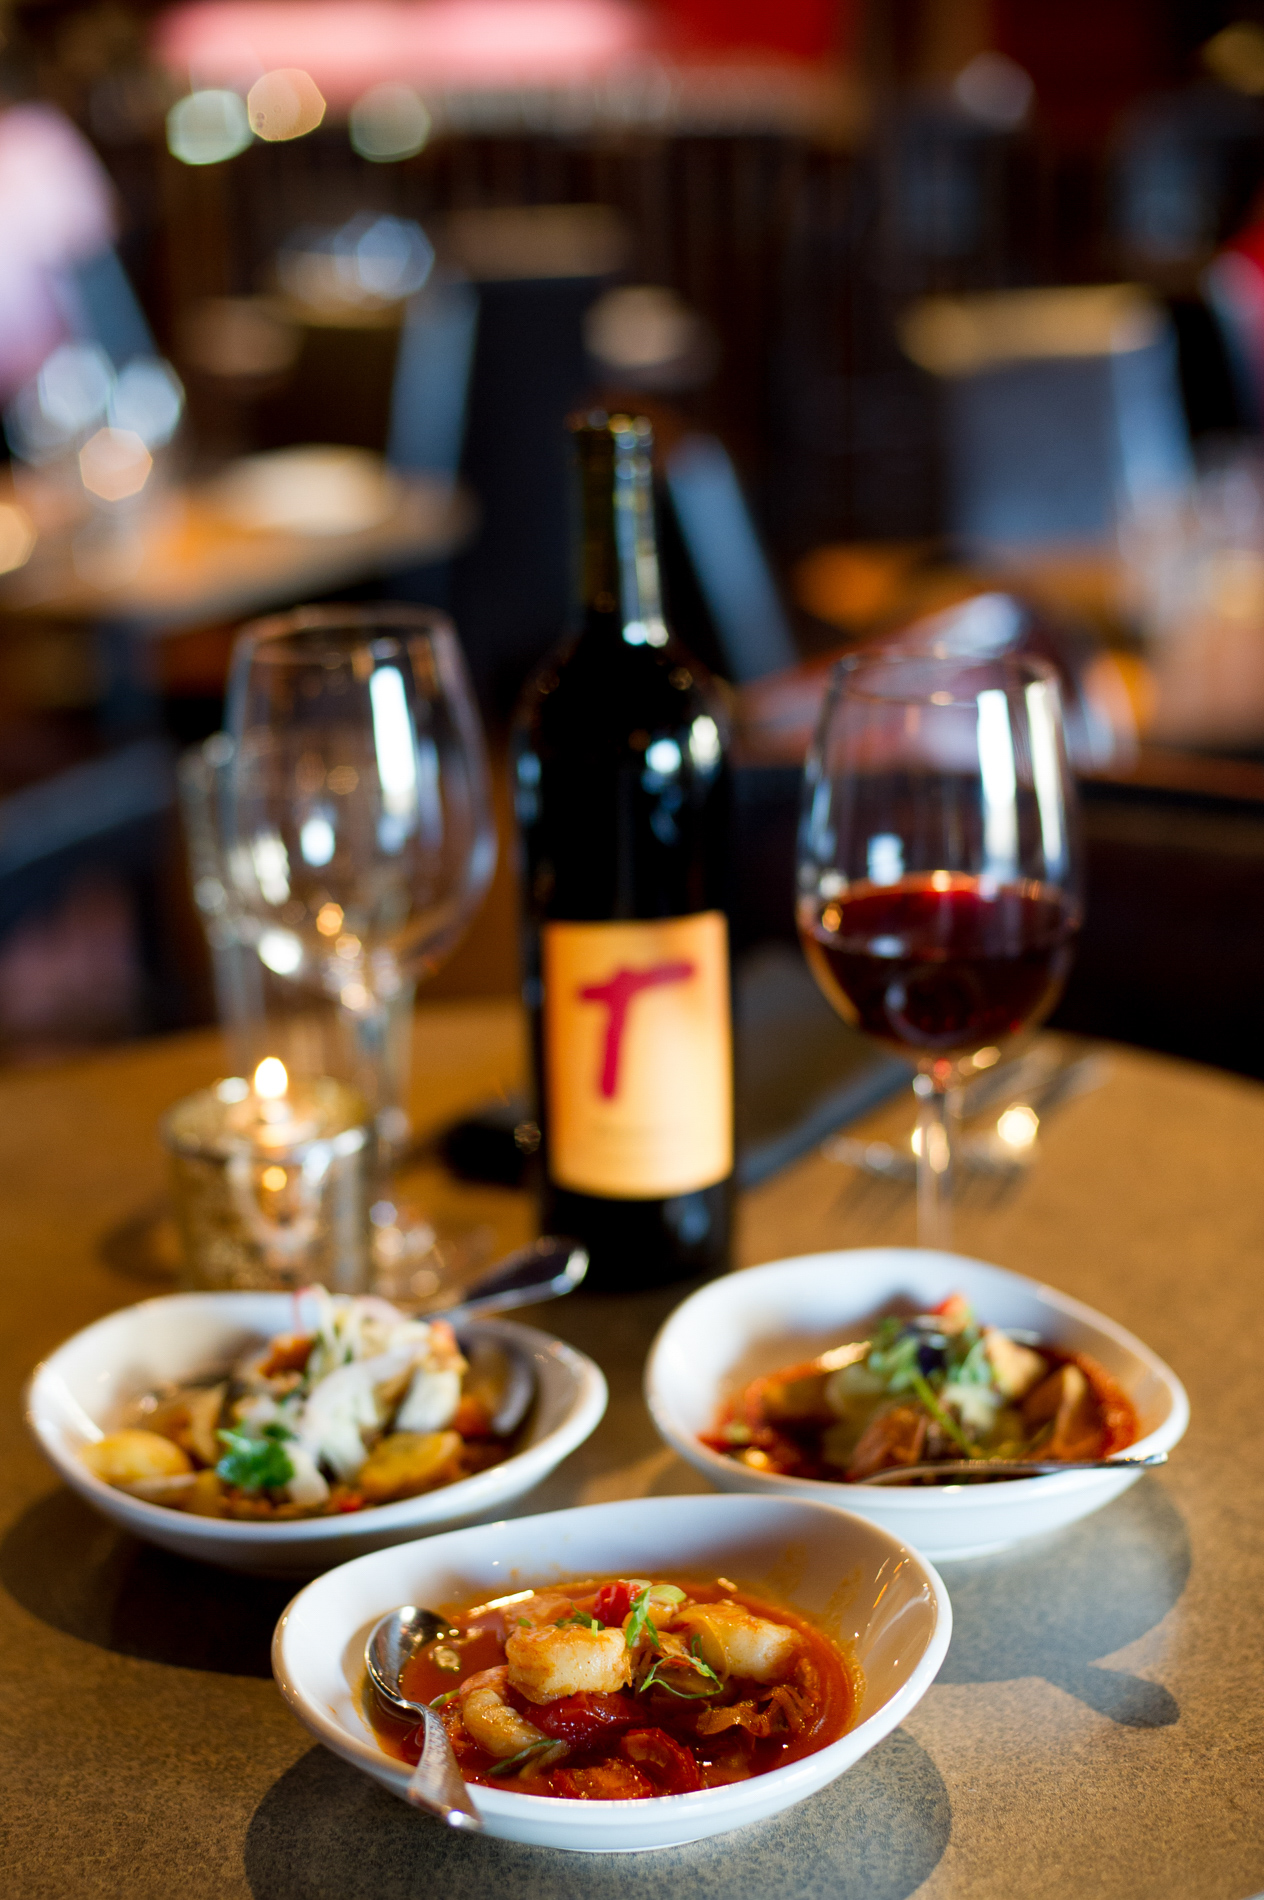 Tagaris Food Photography